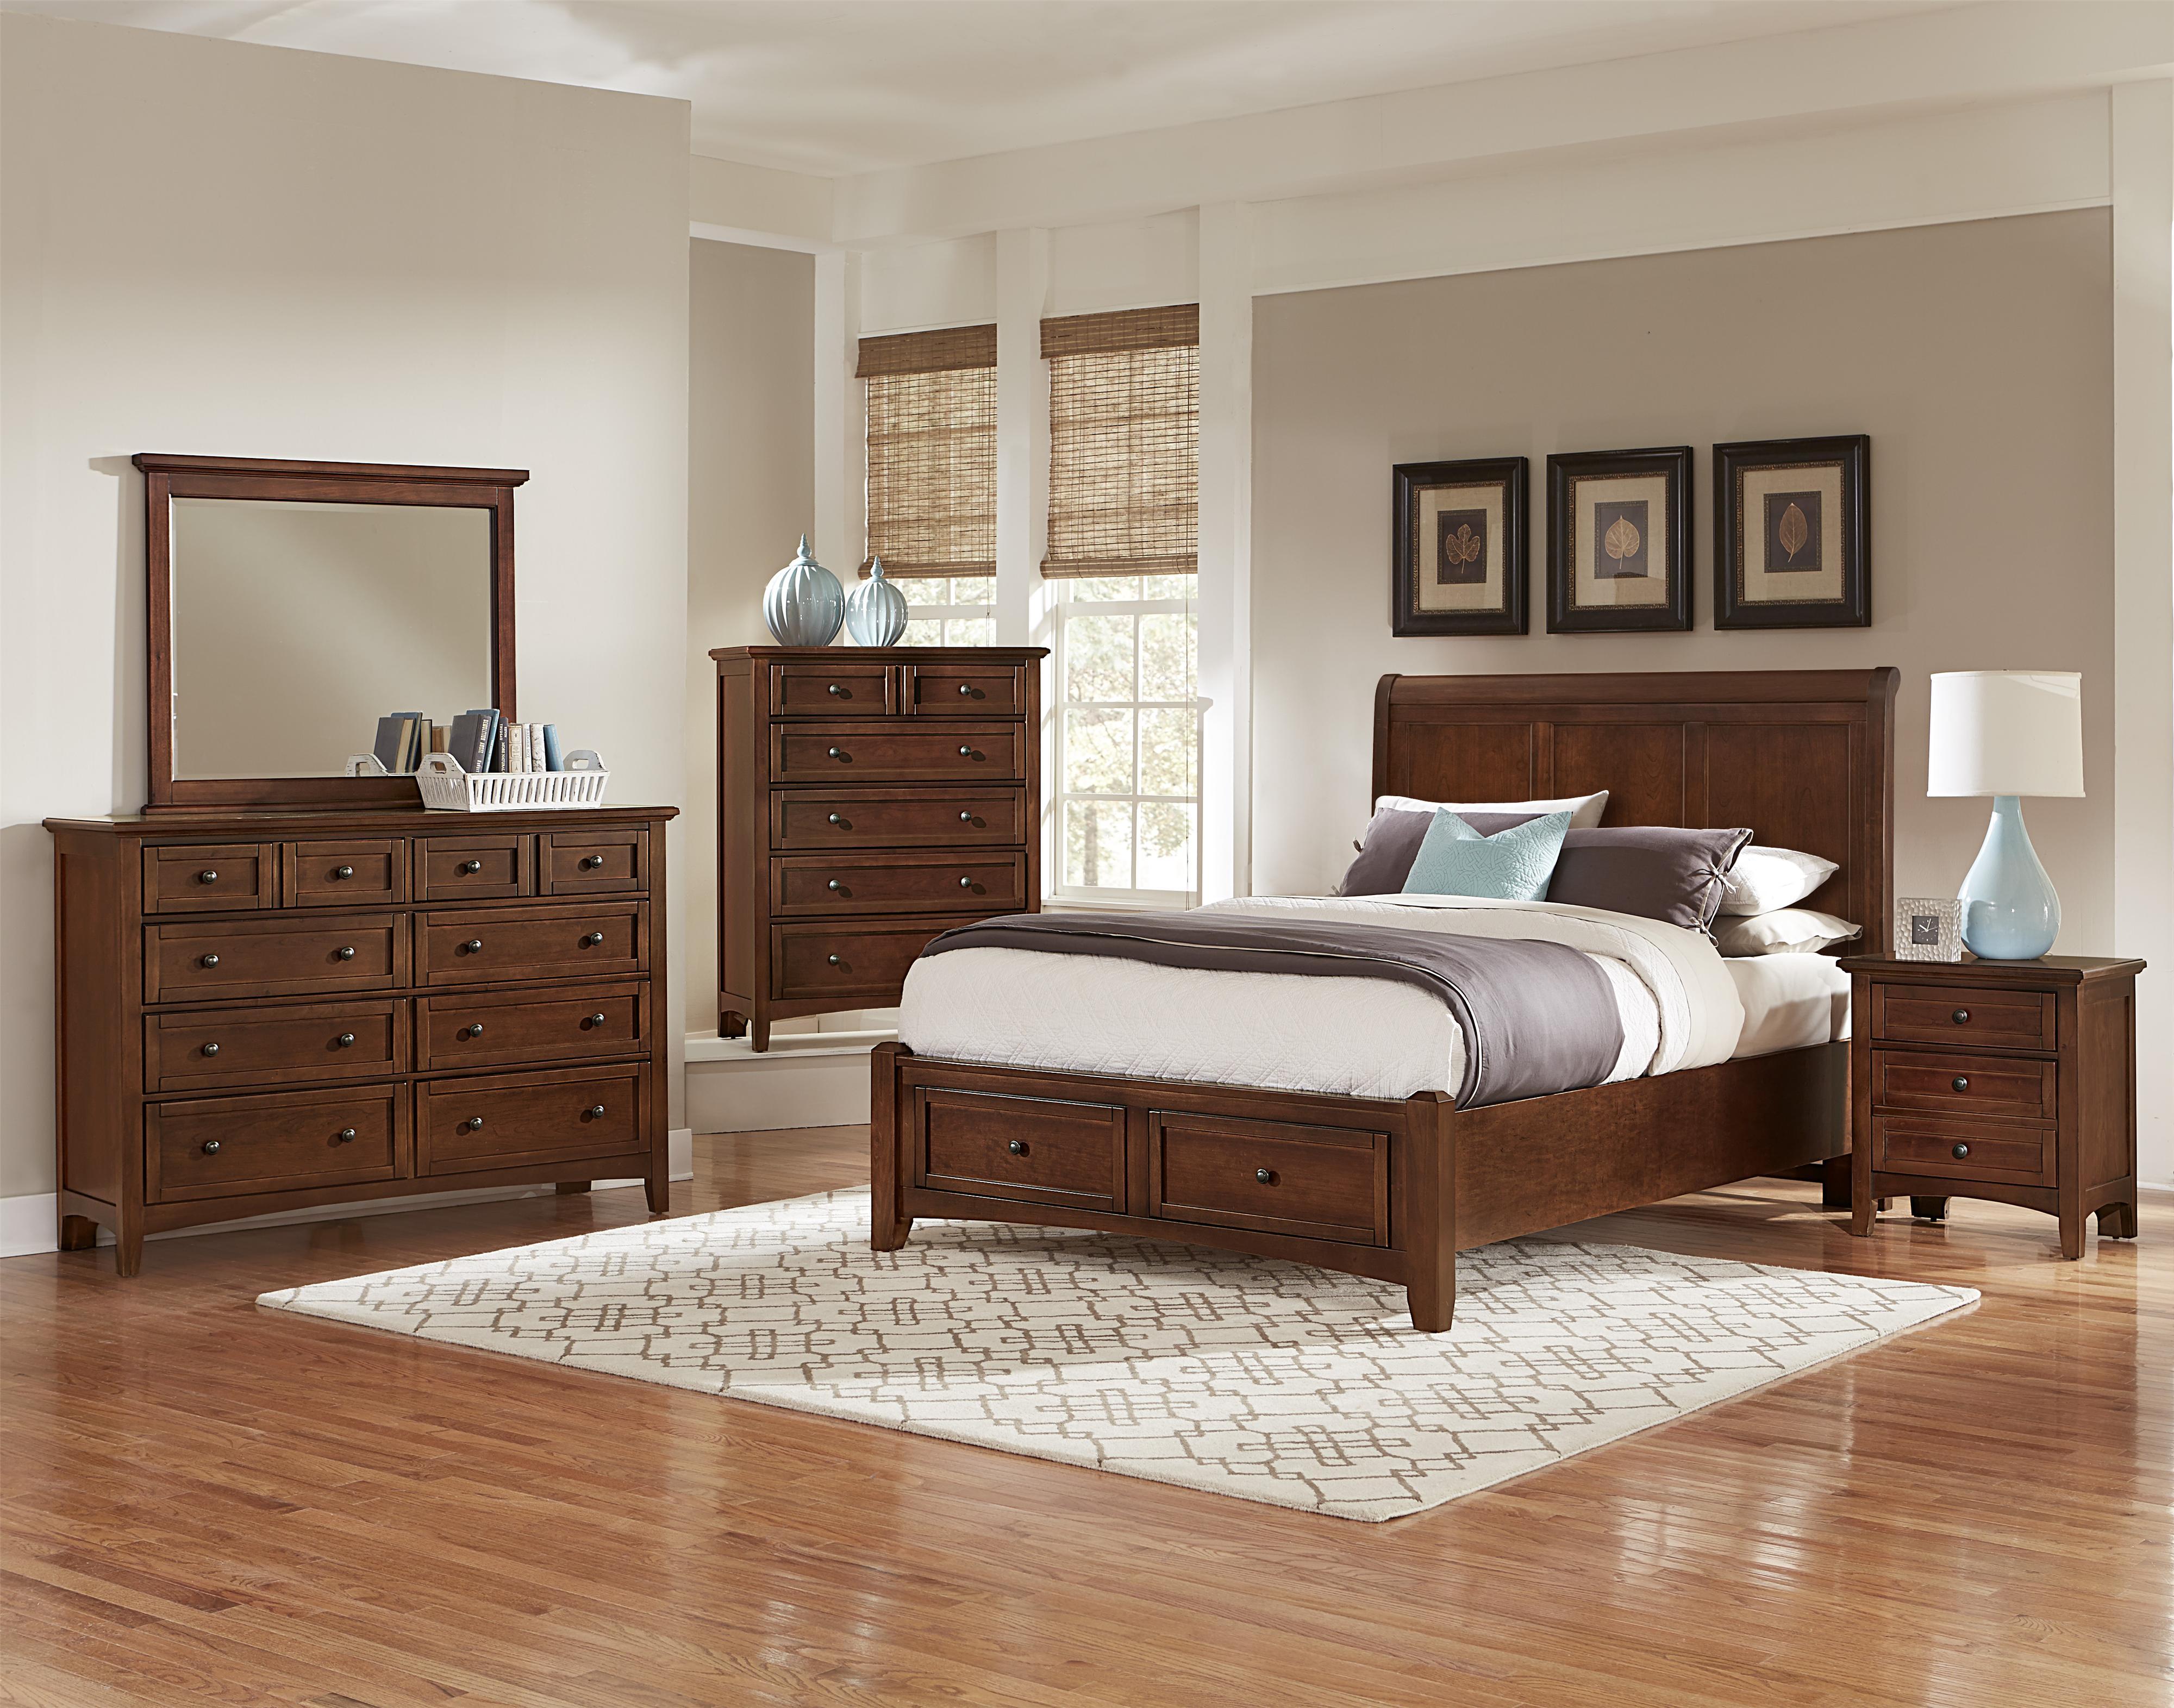 Vaughan Bassett Bonanza Full Bedroom Group - Item Number: BB28 F Bedroom Group 5